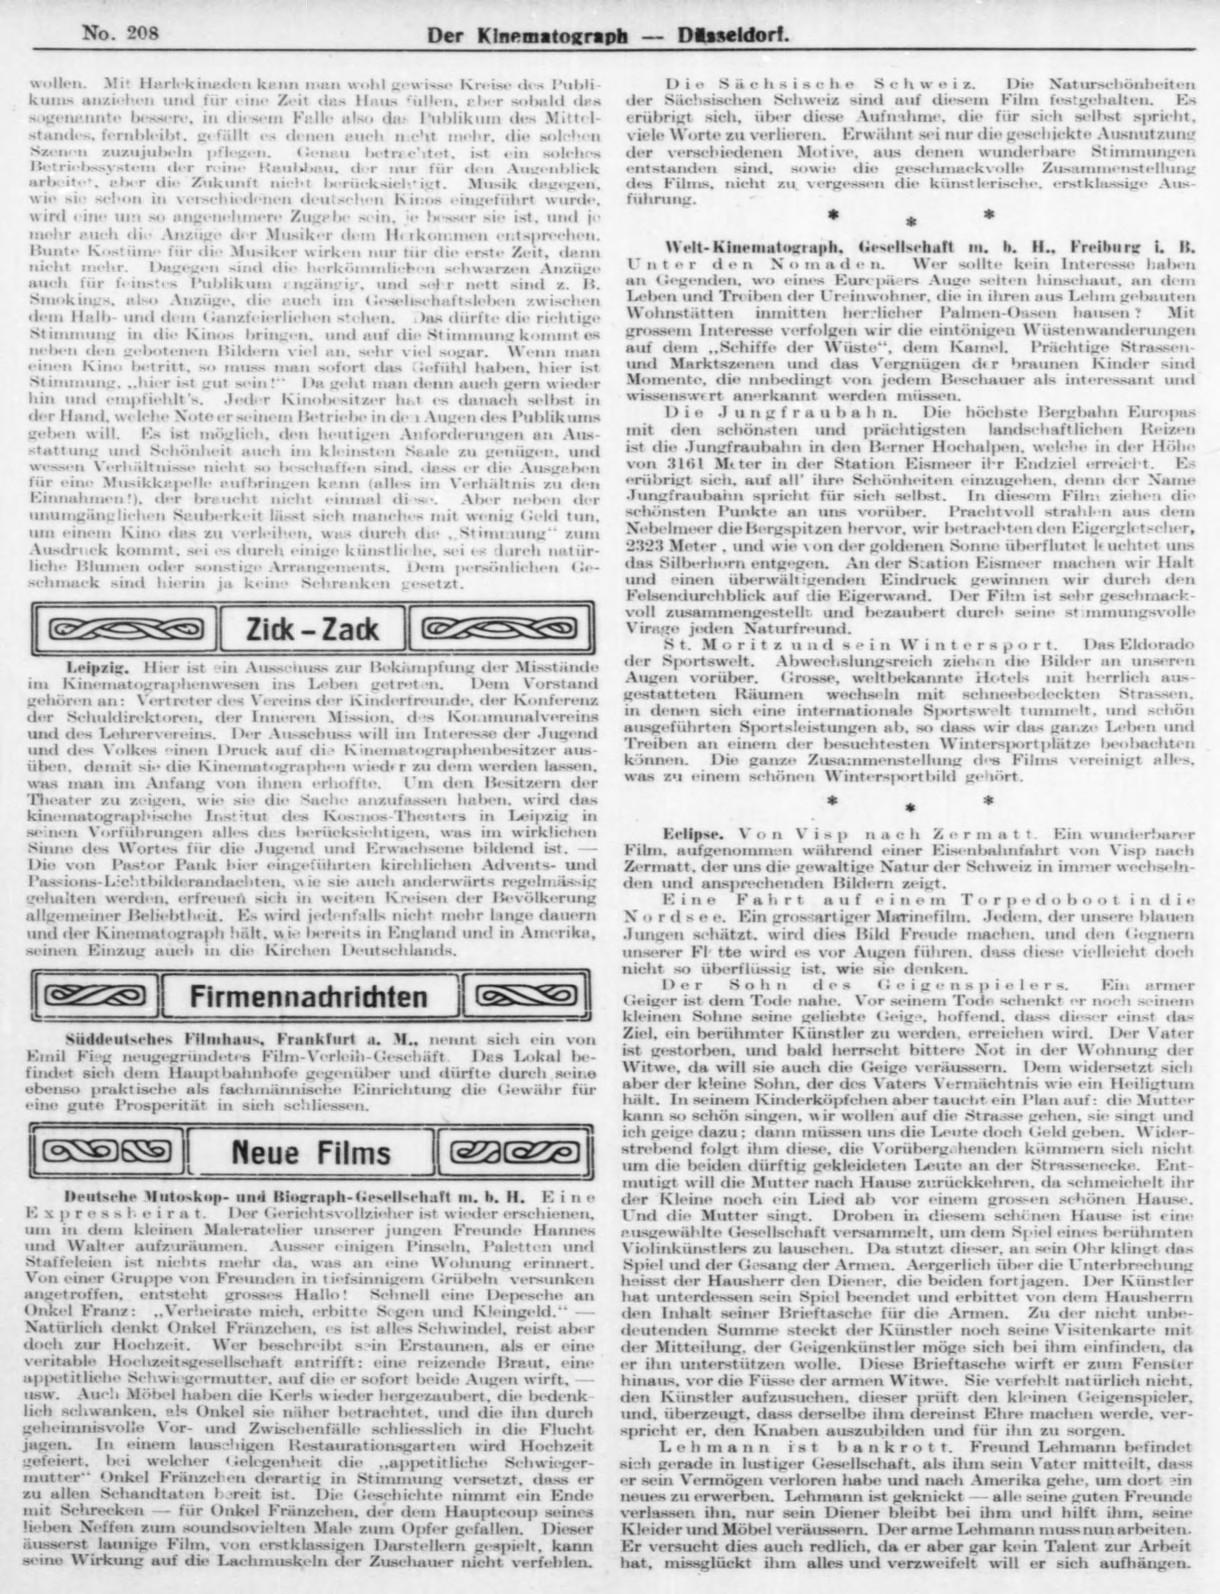 Kinematograph04-1910-12_jp2.zip&file=kinematograph04-1910-12_jp2%2fkinematograph04-1910-12_0069